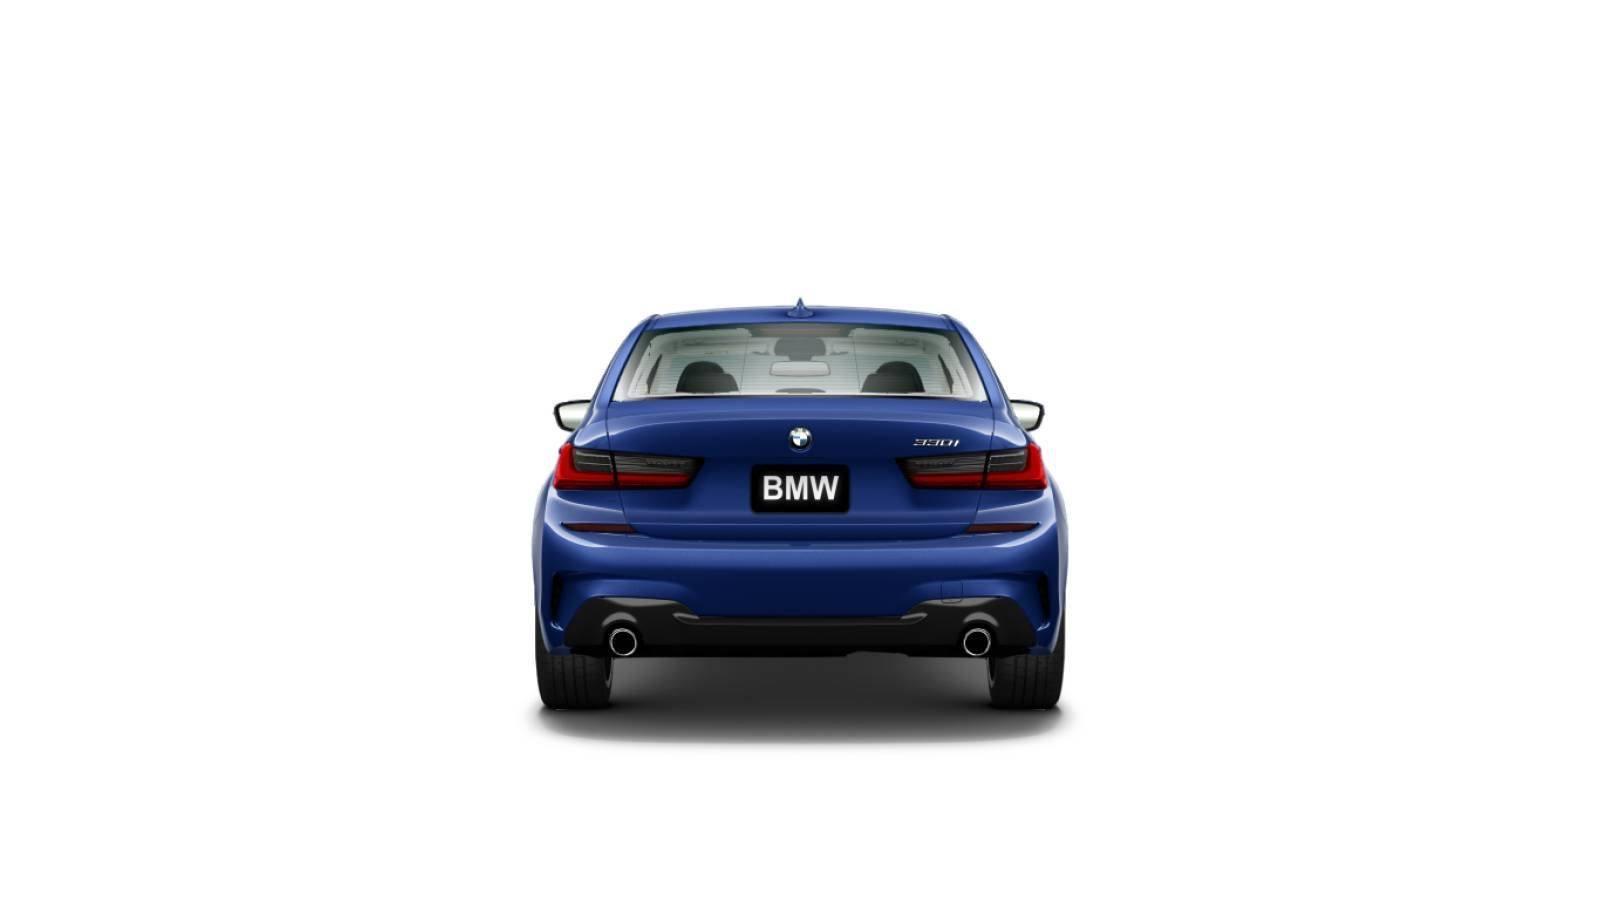 2019 BMW 3 Series G20 - Rear